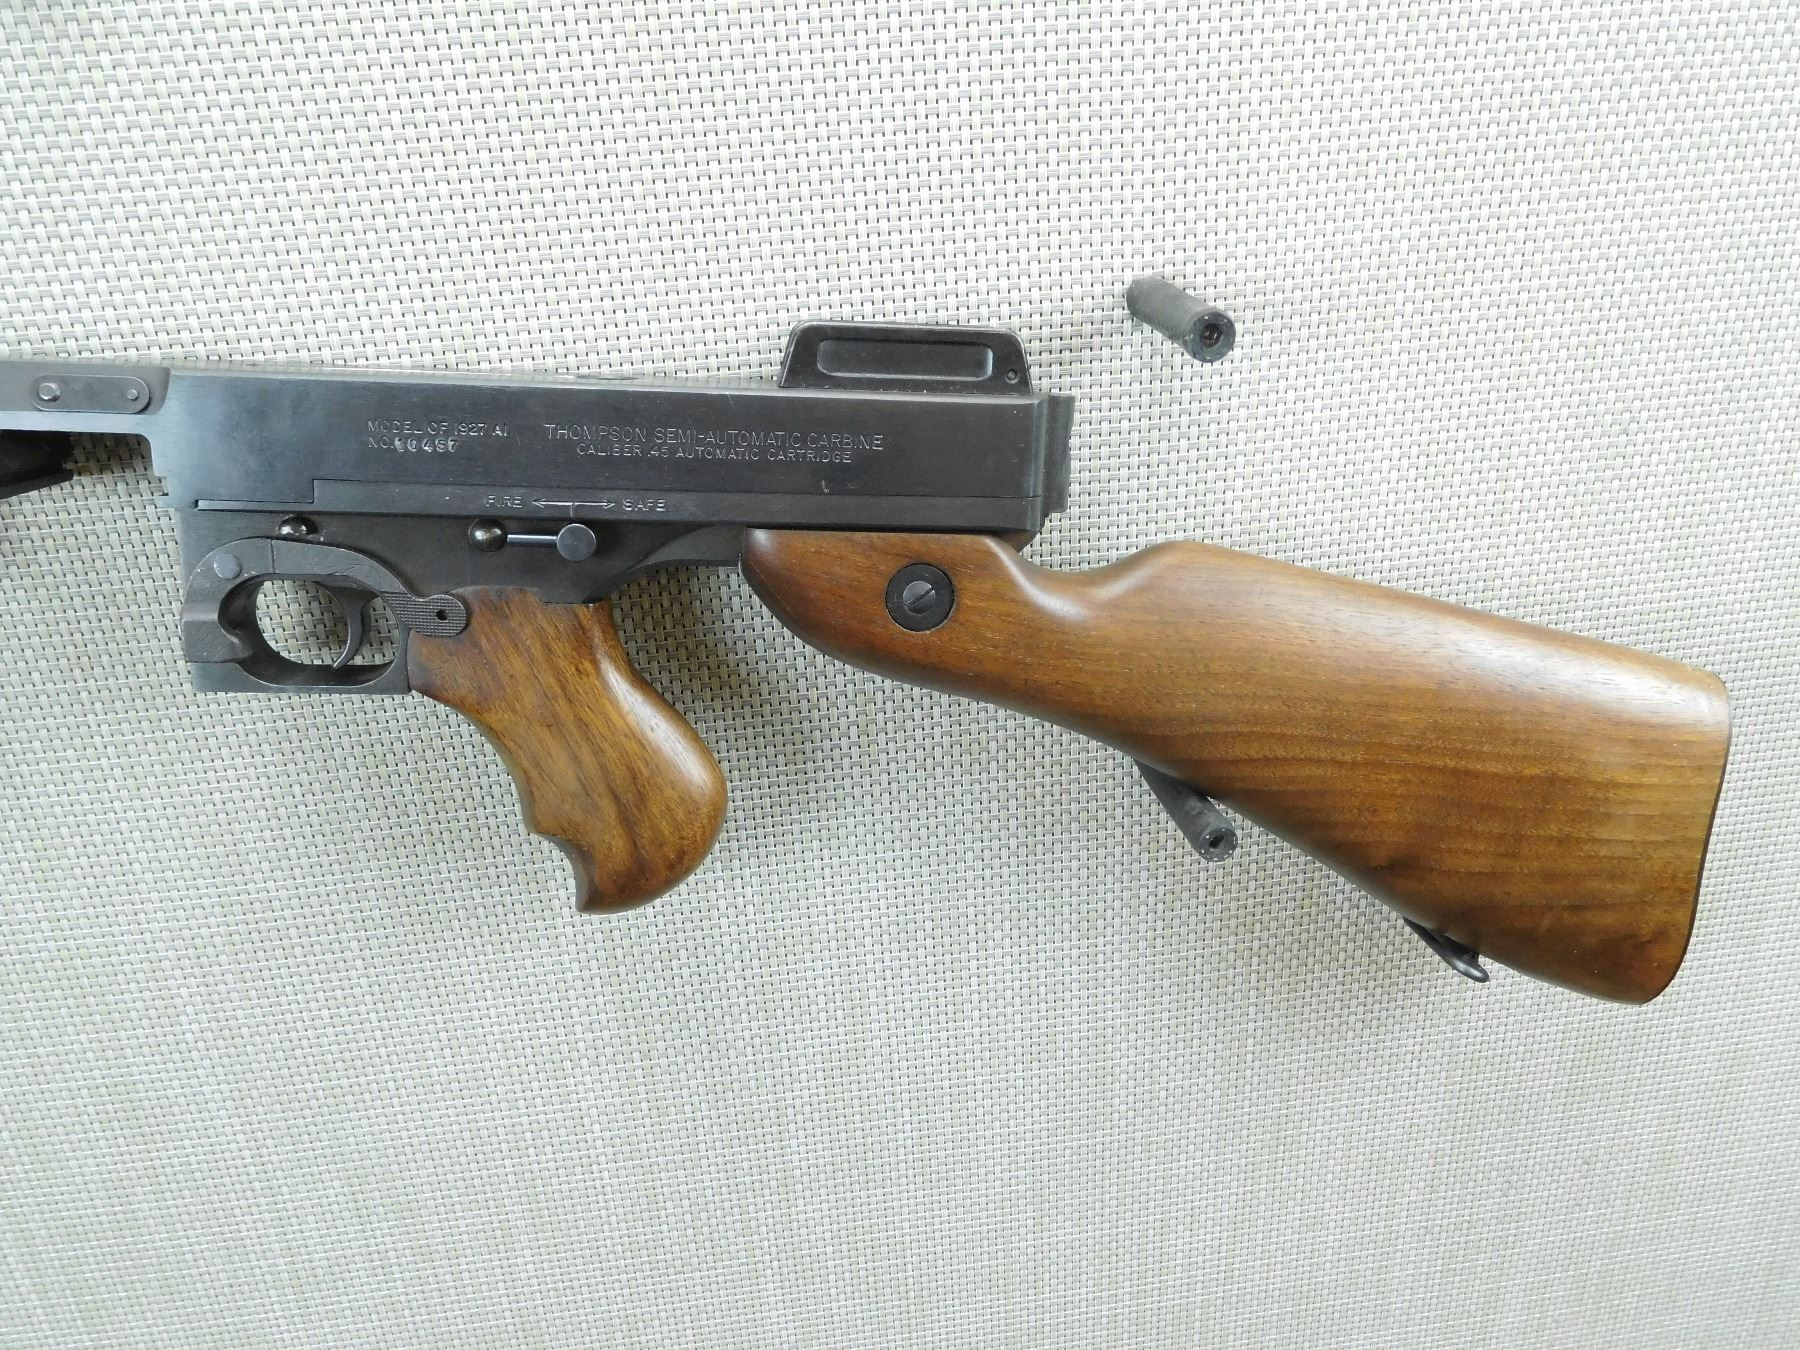 THOMPSON , MODEL: MODEL OF 1927A1 , CALIBER: 45 ACP